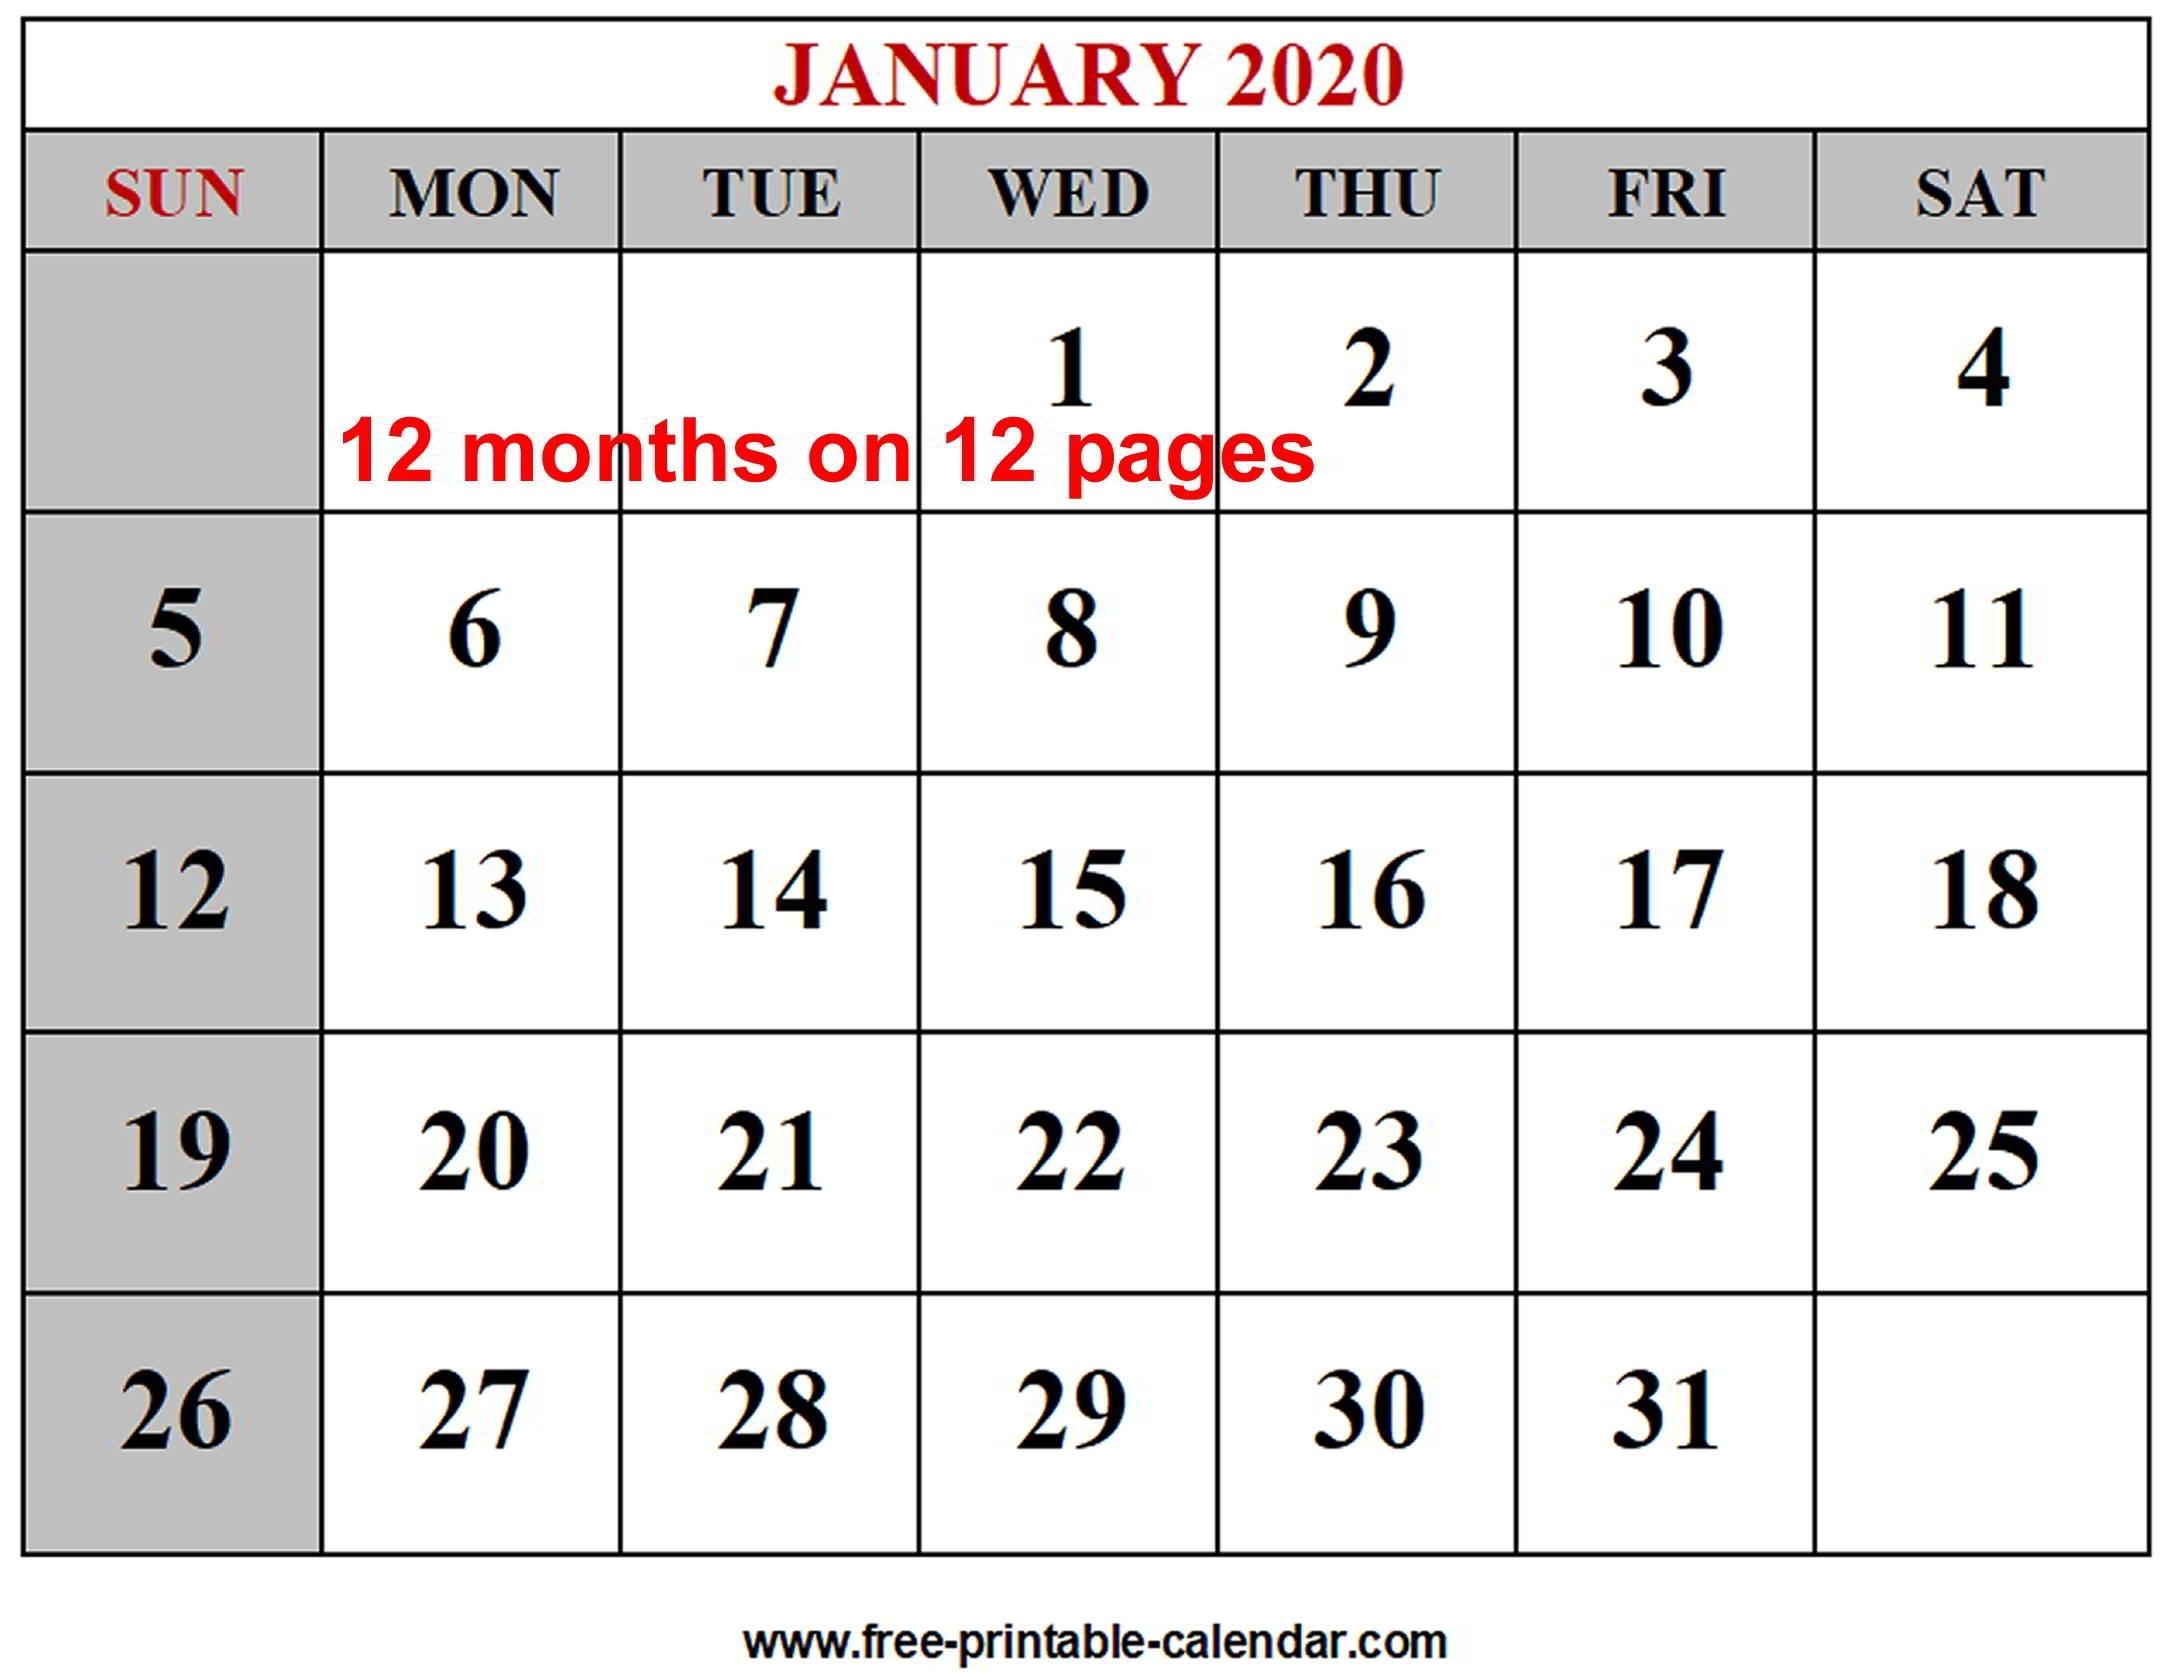 Year 2020 Calendar Templates - Free-Printable-Calendar inside Blank Calendar 2020 Printable Monthly